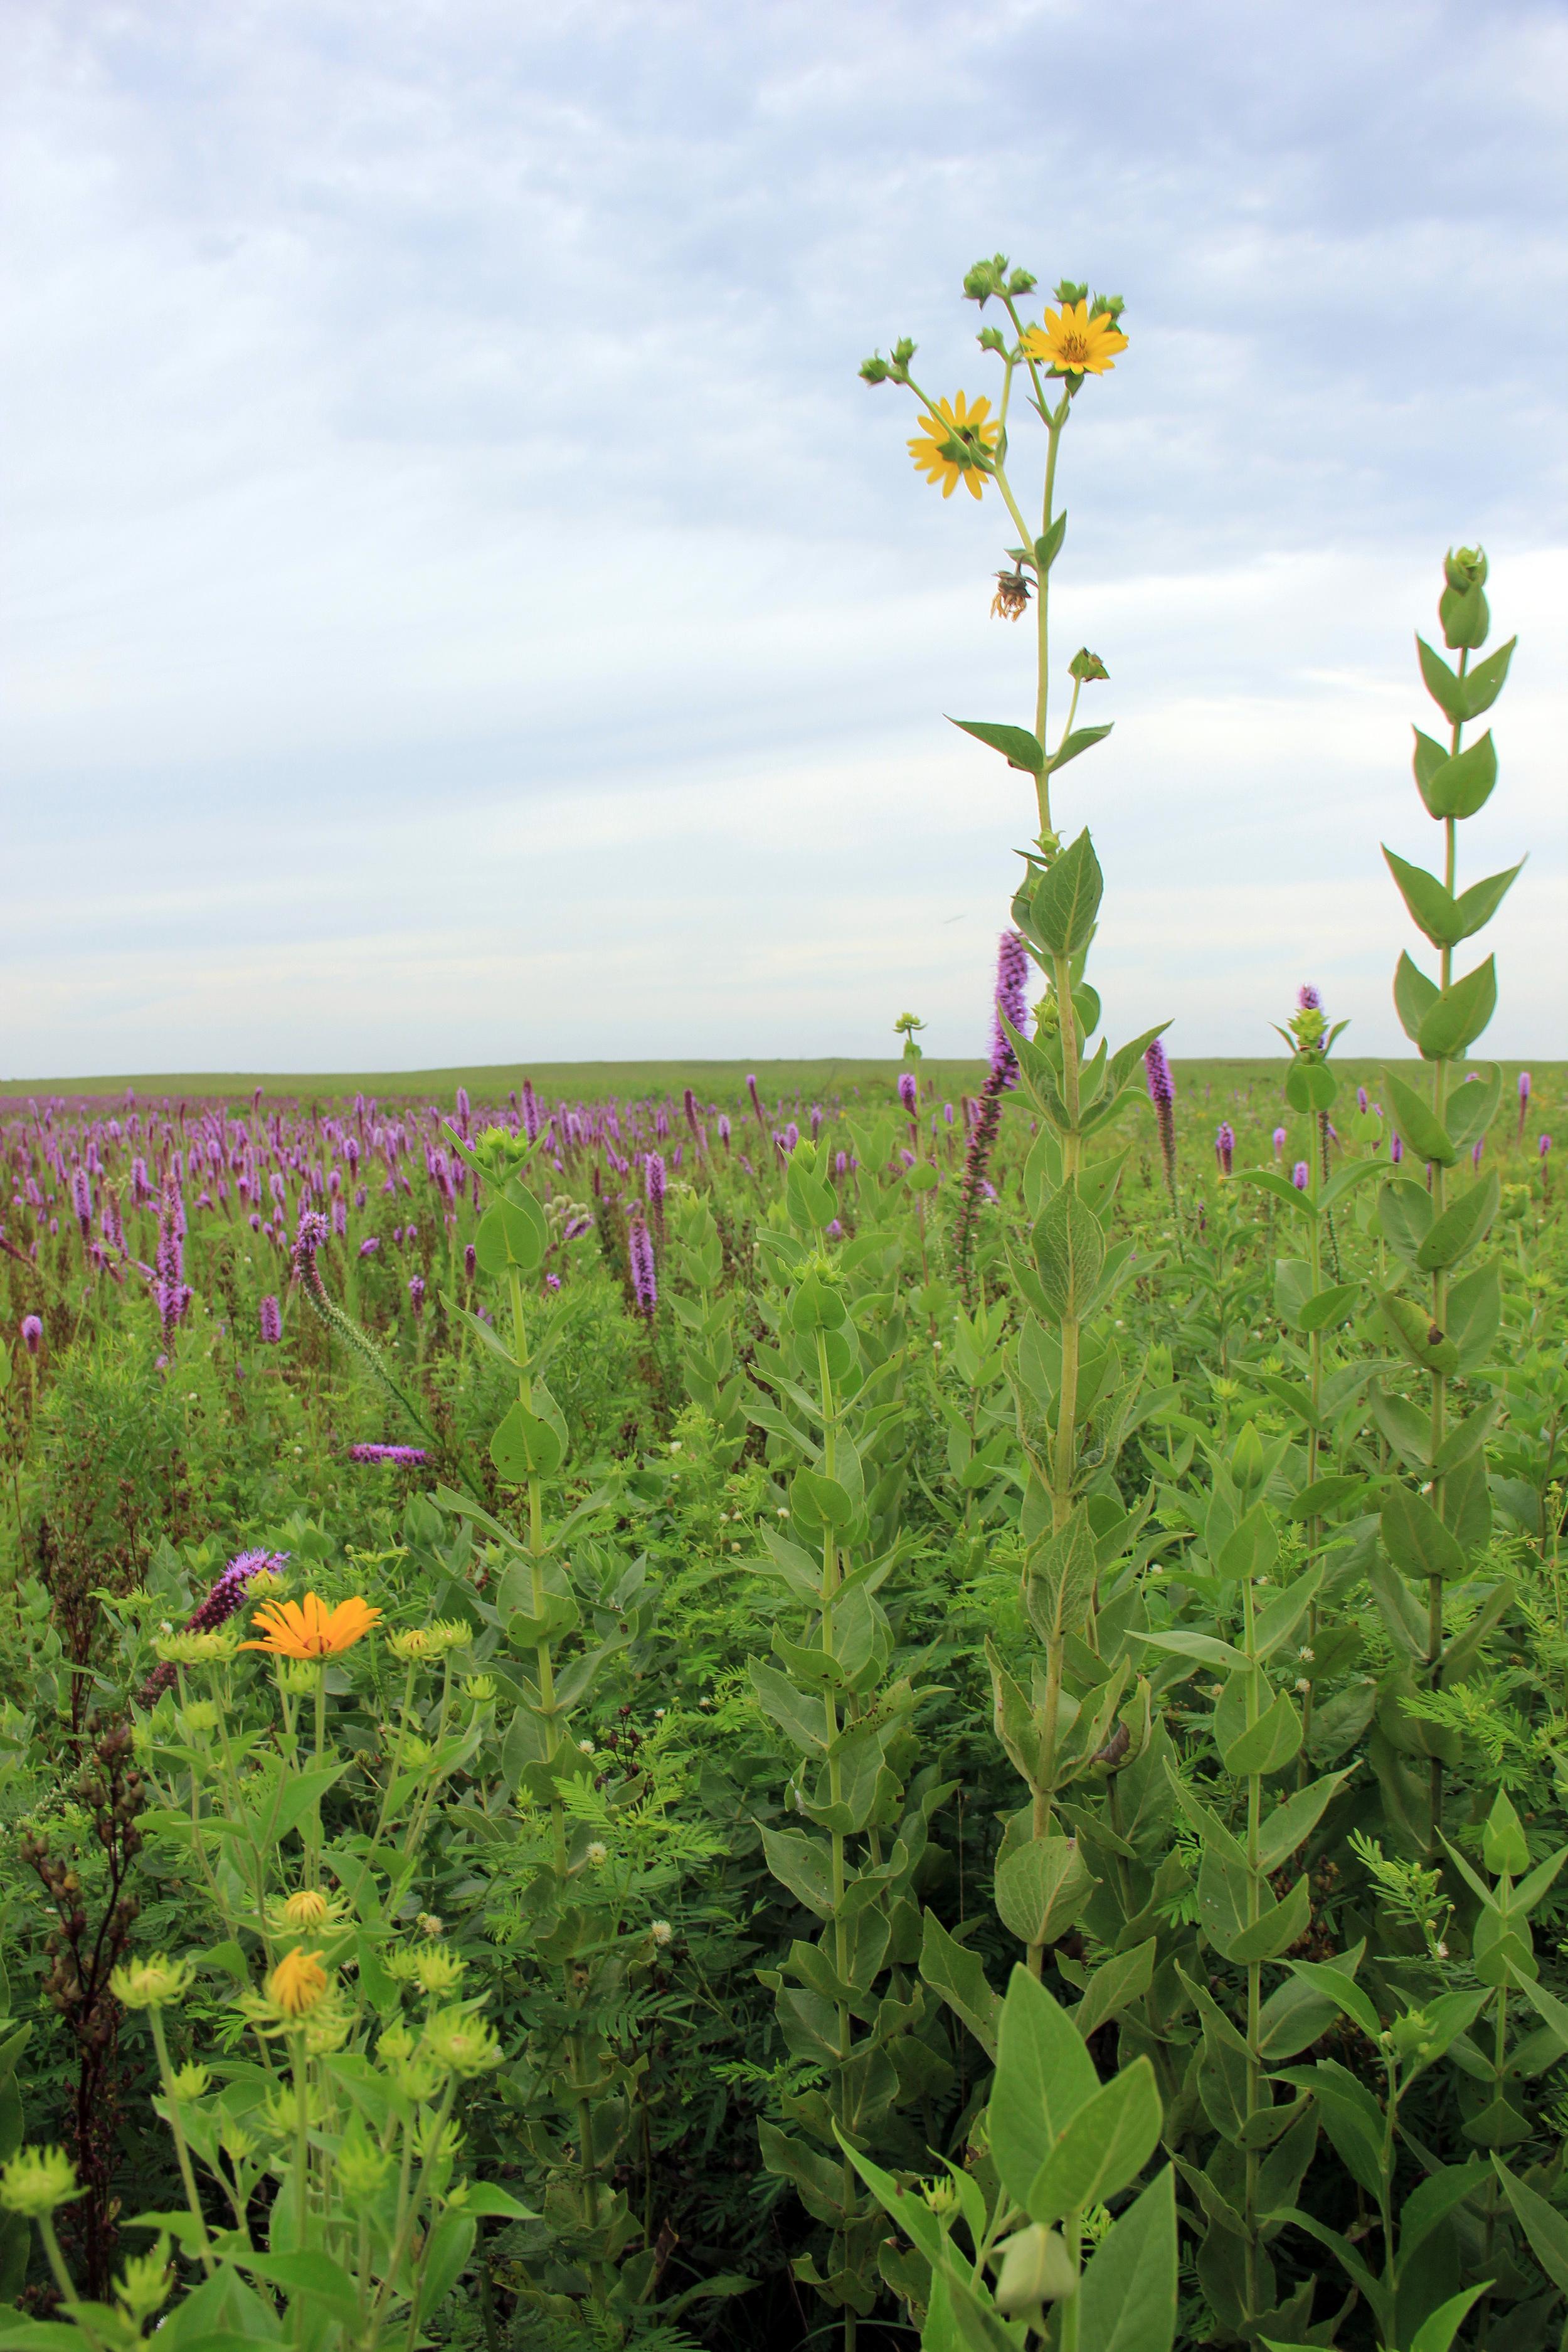 prairie-pic-3-jeff.jpg